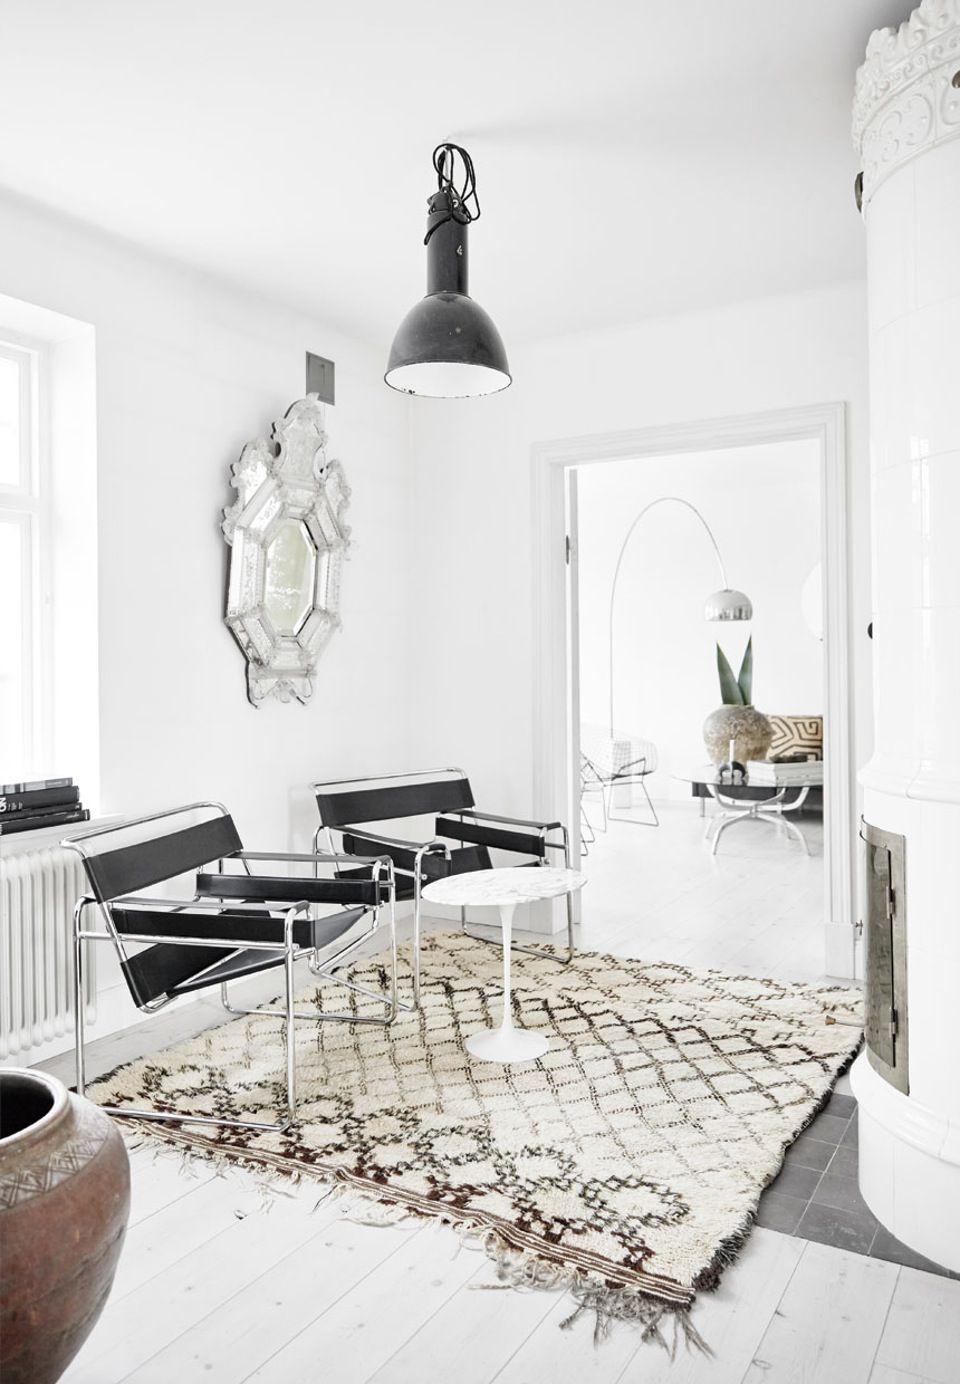 Ethnic and nordic apartment seaofgirasoles